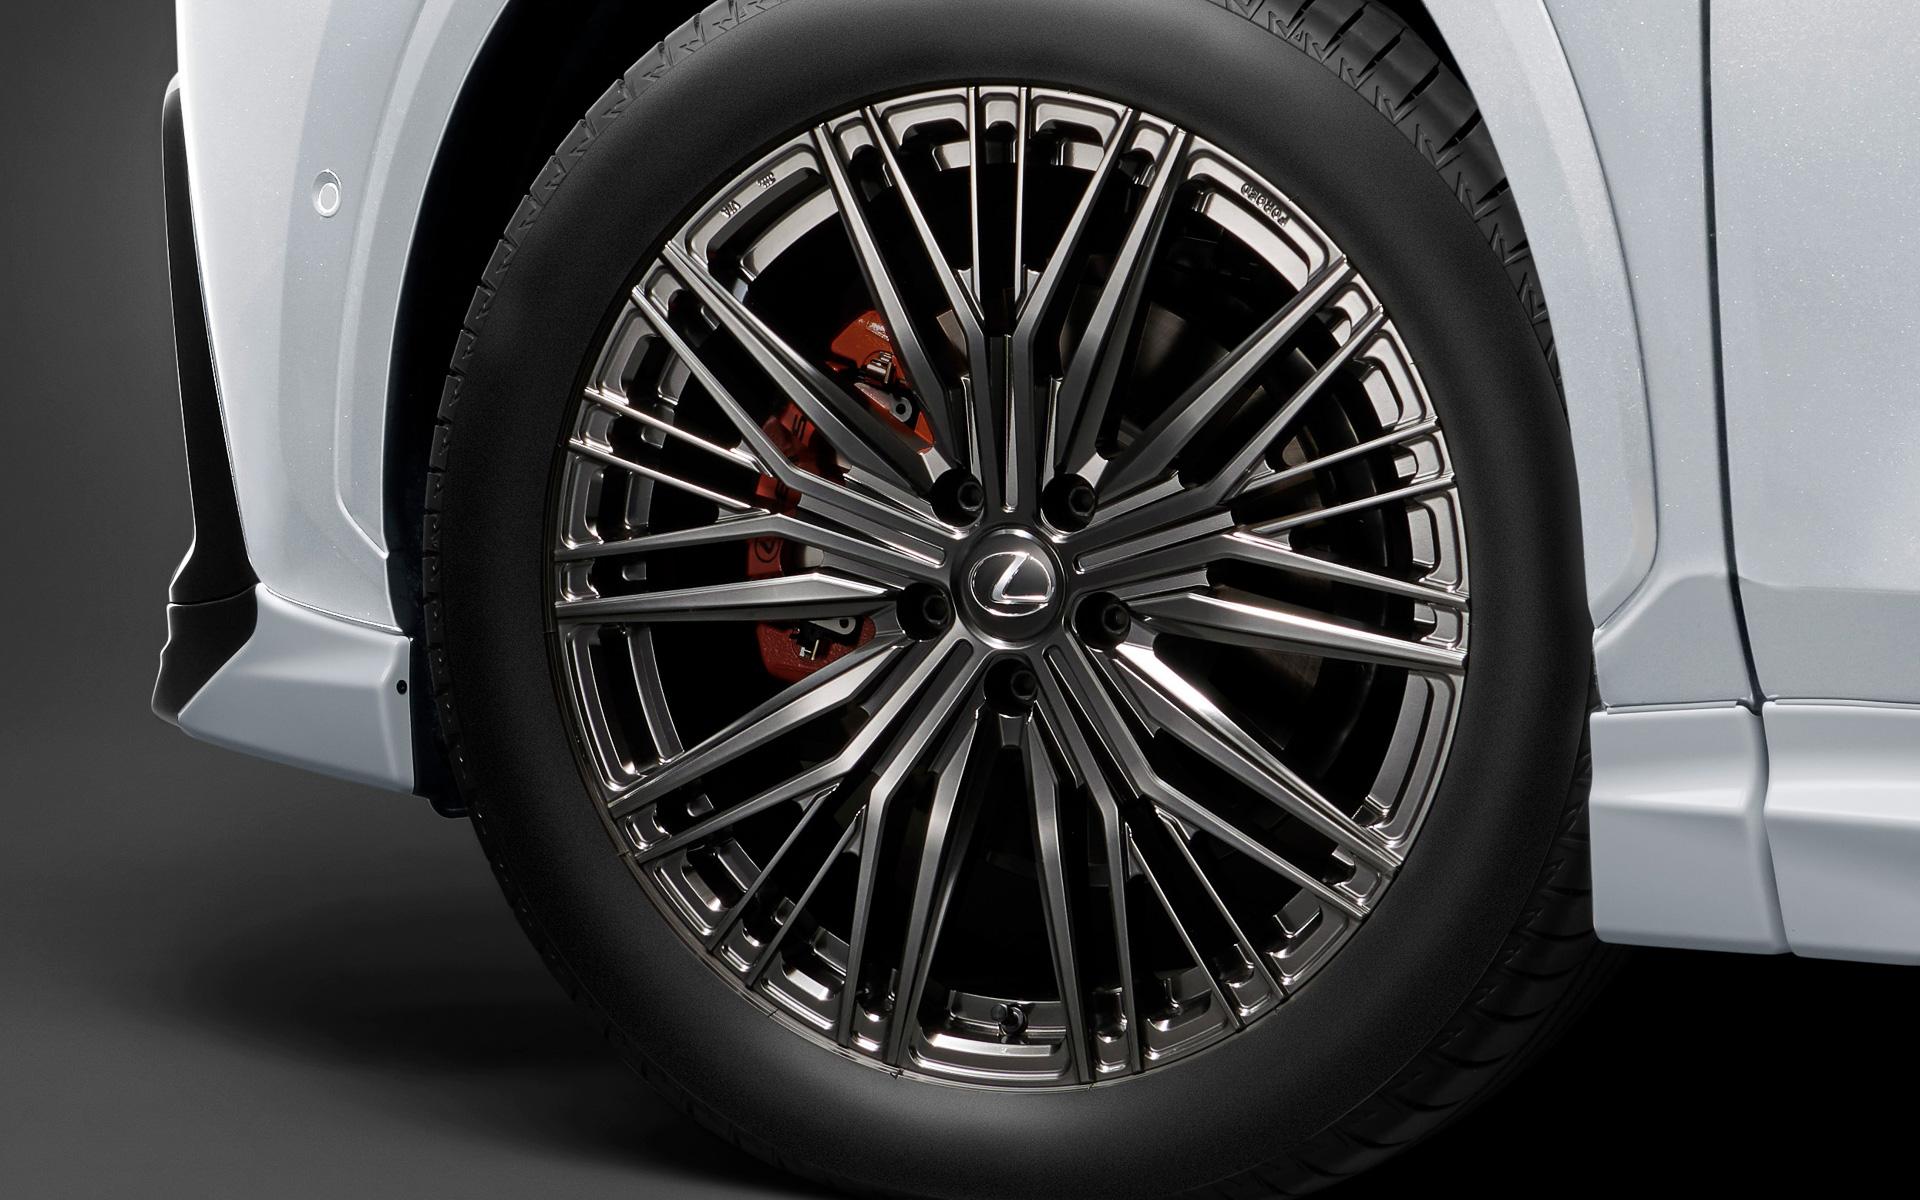 Lexus-NX-TRD-parts-8